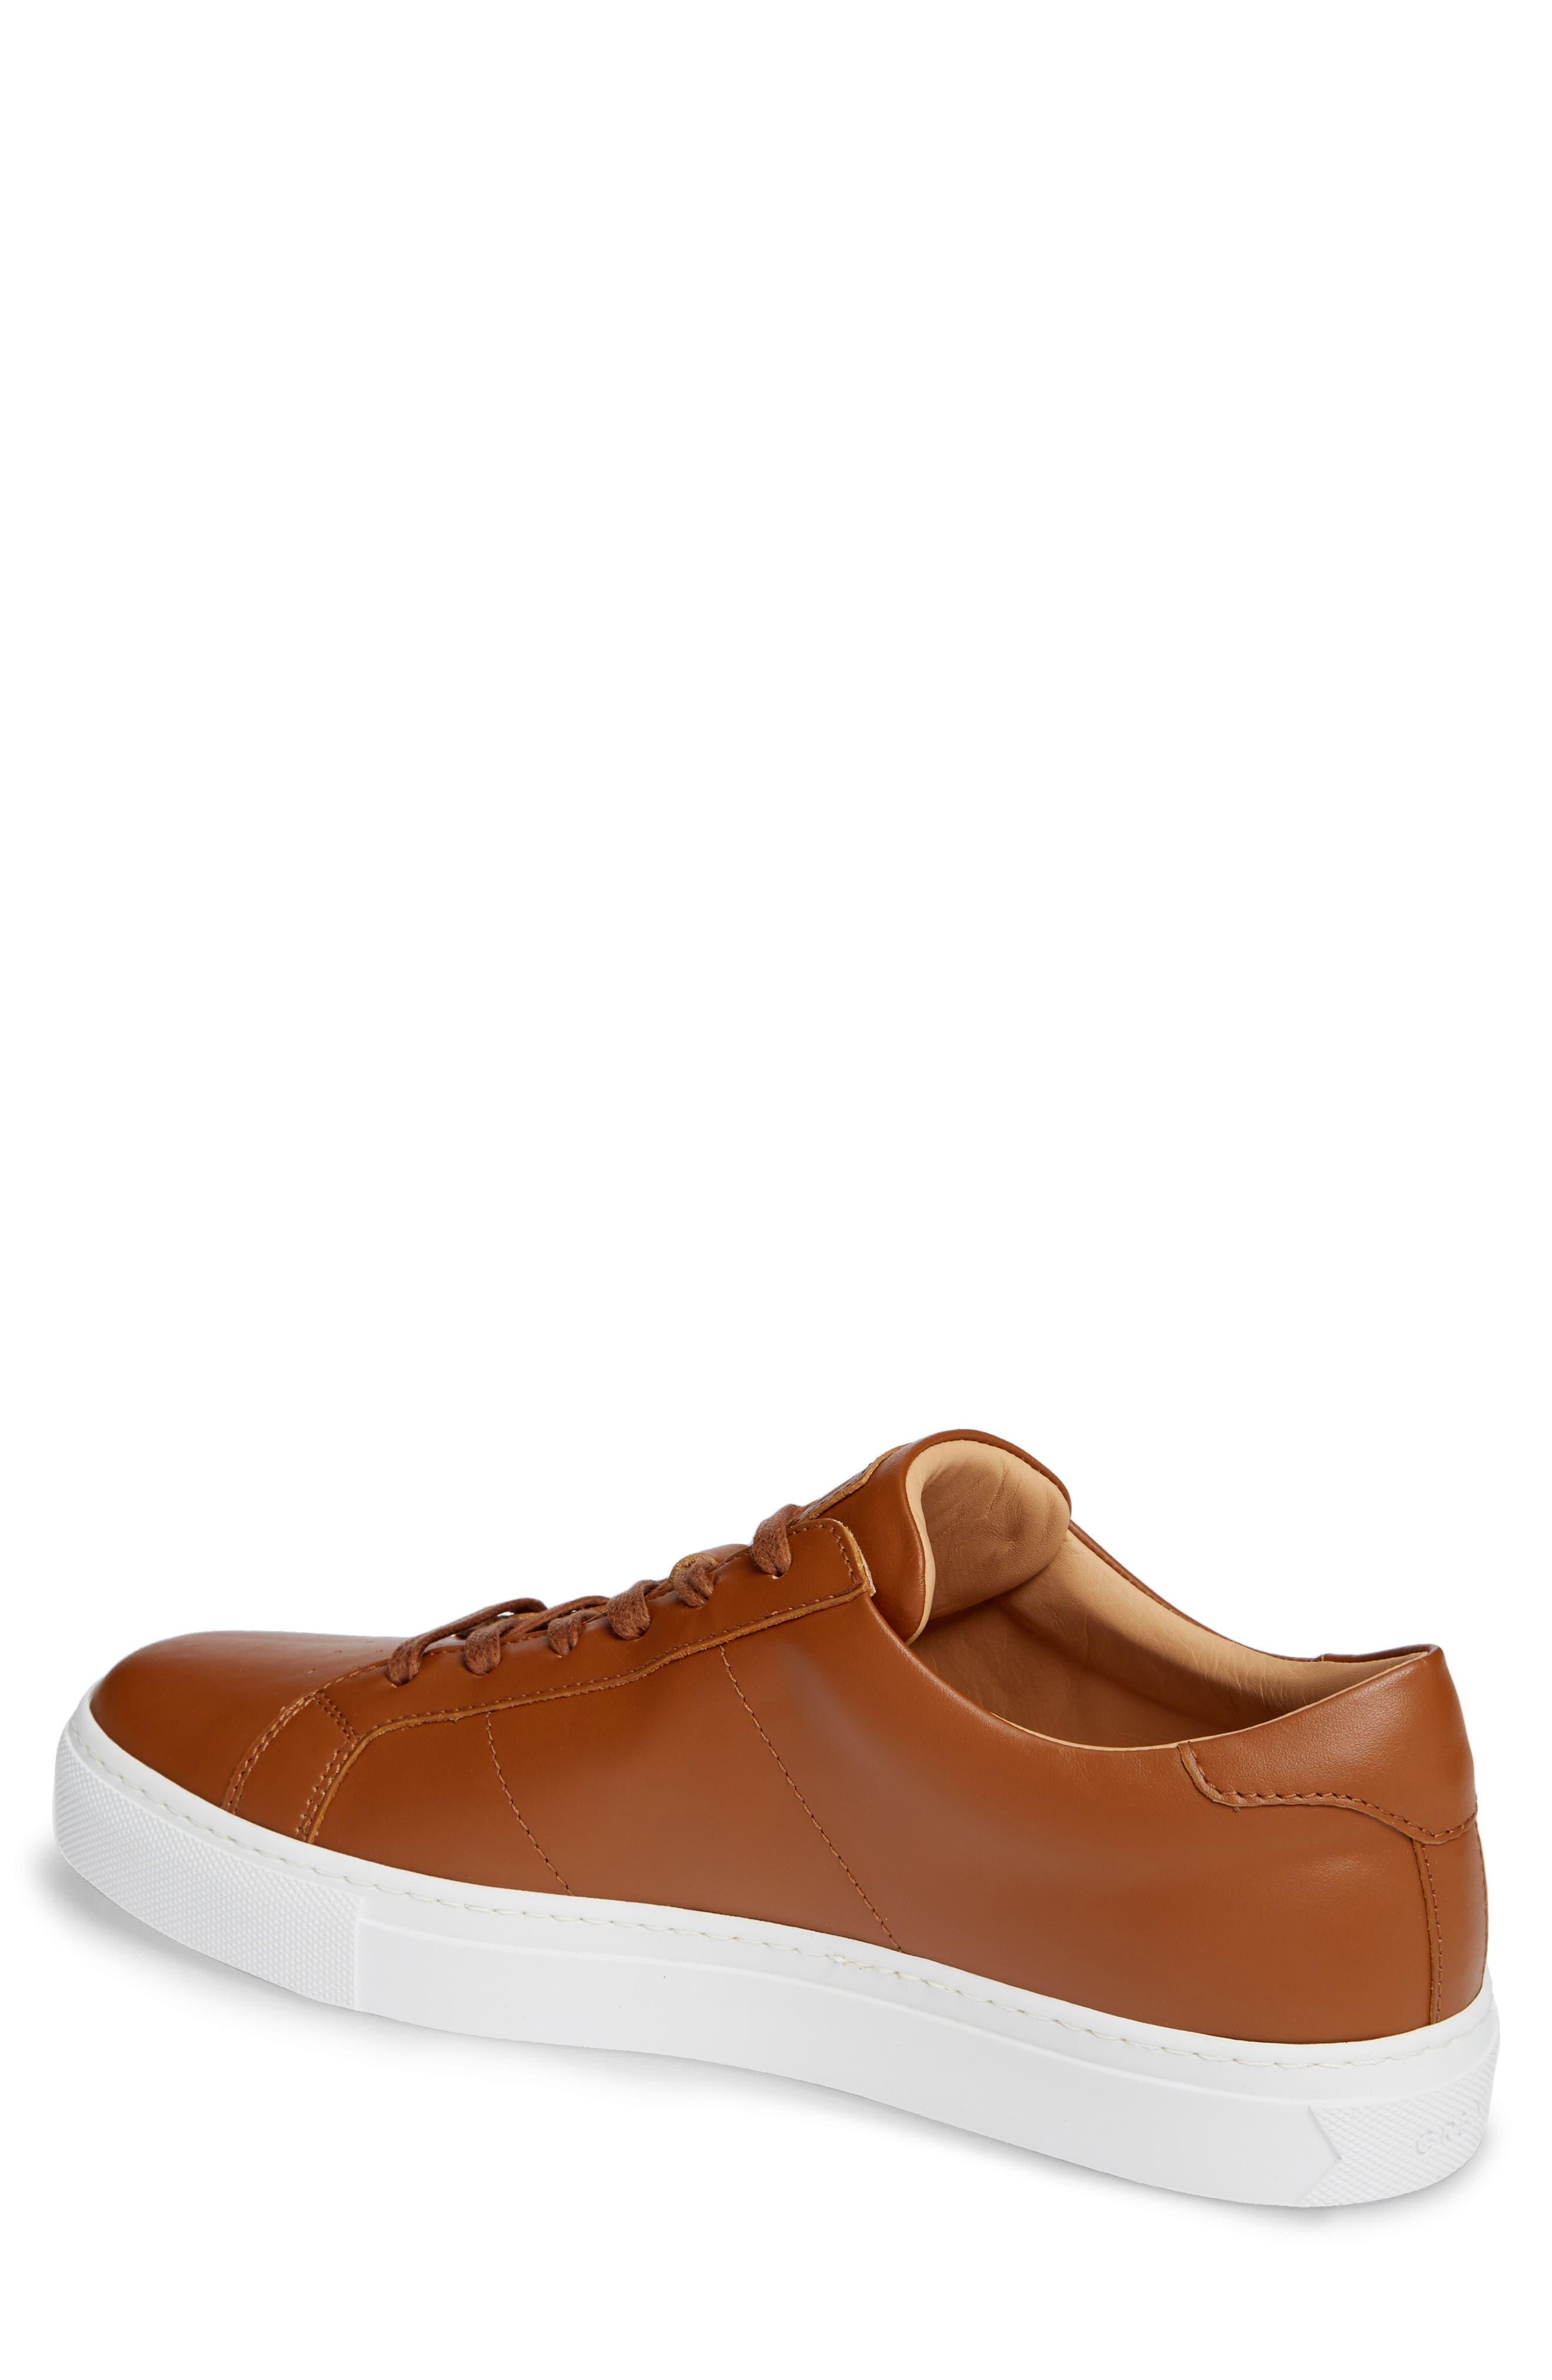 Royale Sneaker,                             Alternate thumbnail 2, color,                             TAN LEATHER